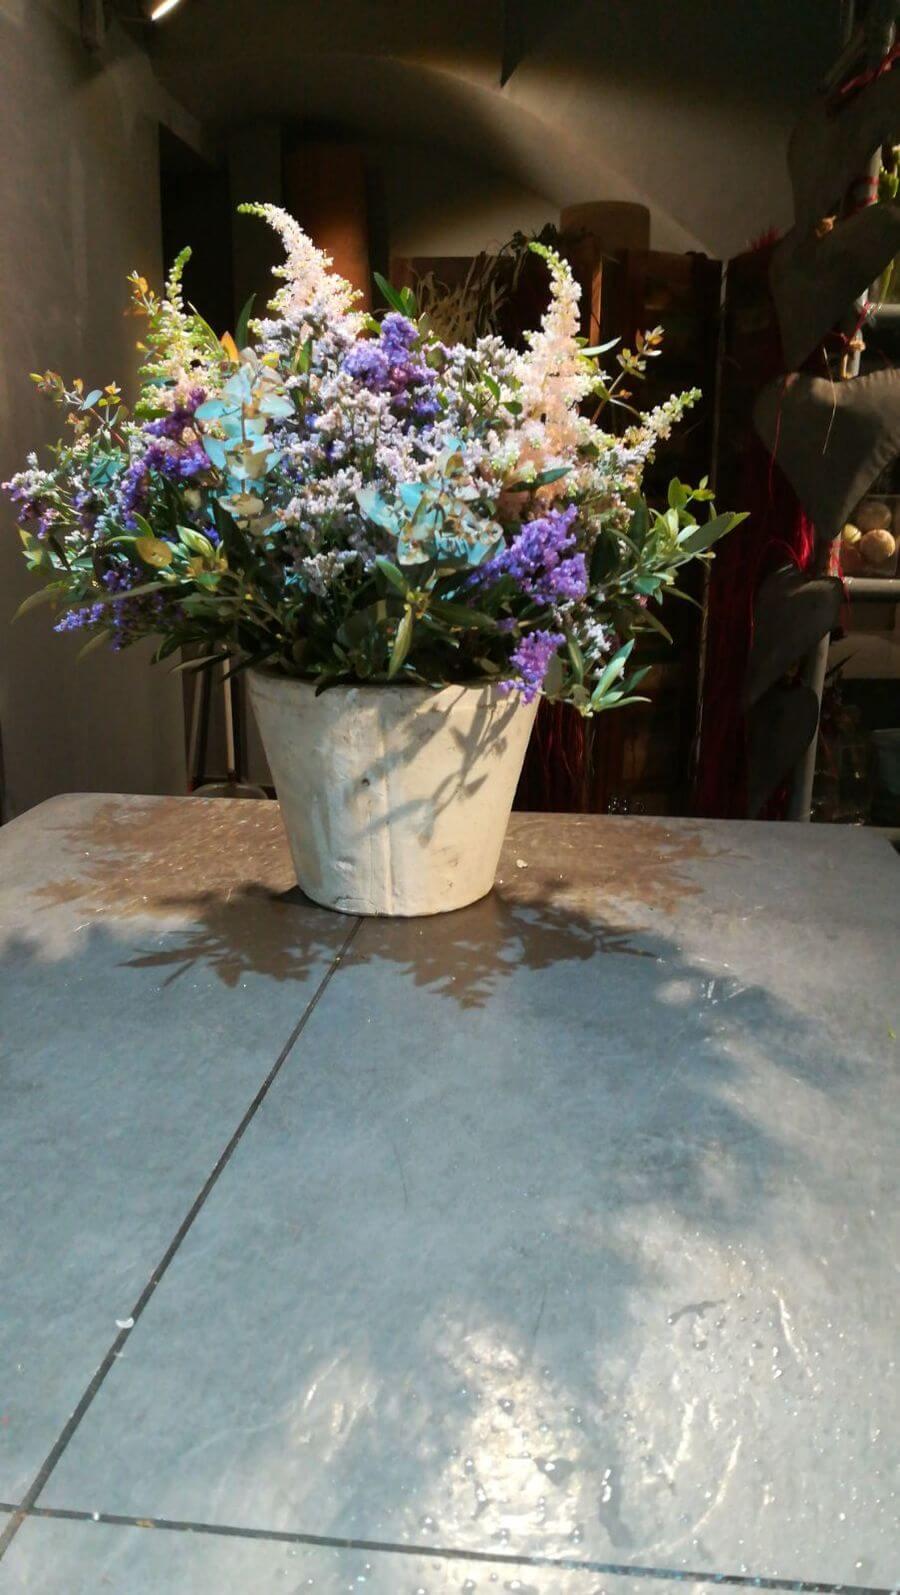 flors_plantes_bertran_particulars_7